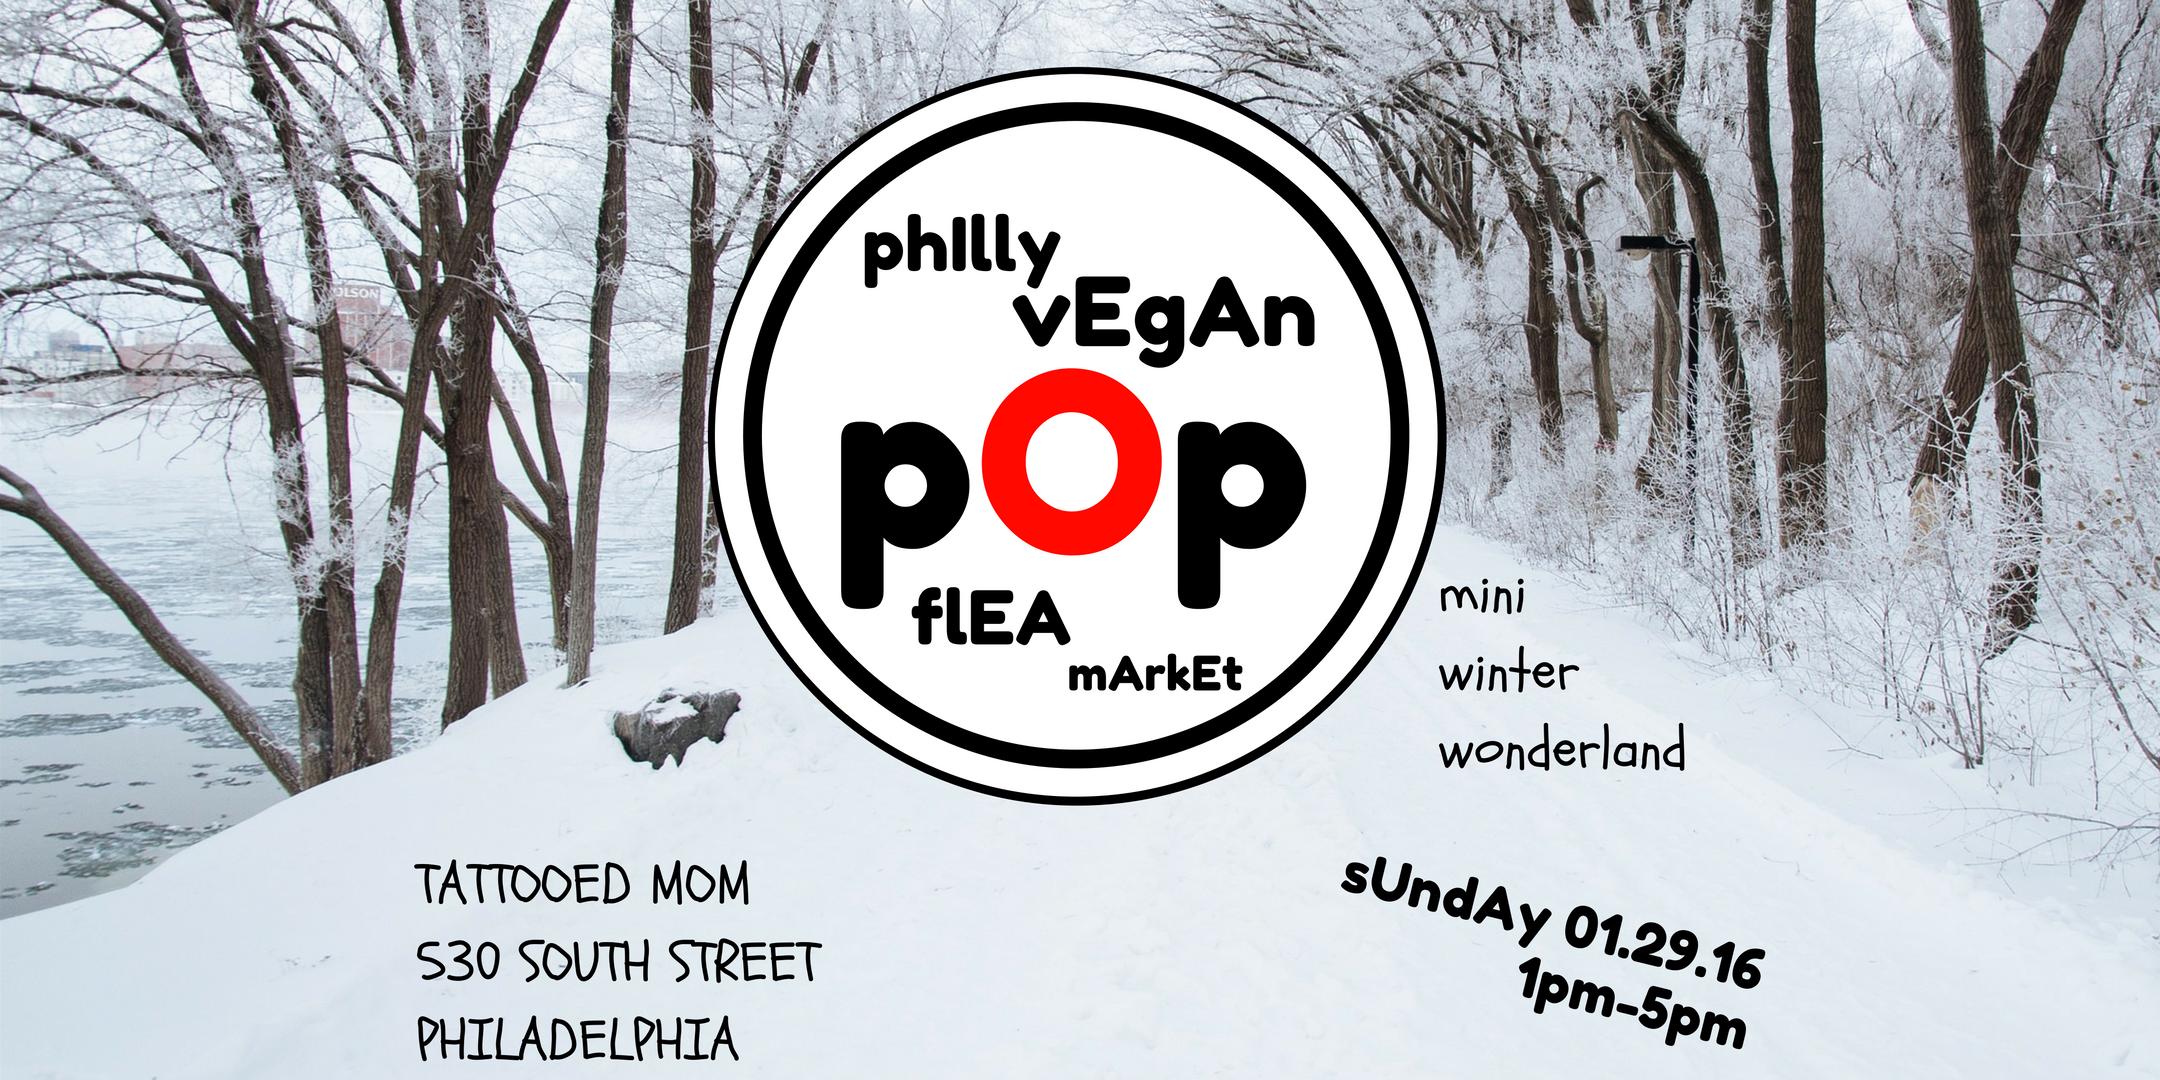 Philly Vegan Pop Flea - Mini WInter Wonderlan